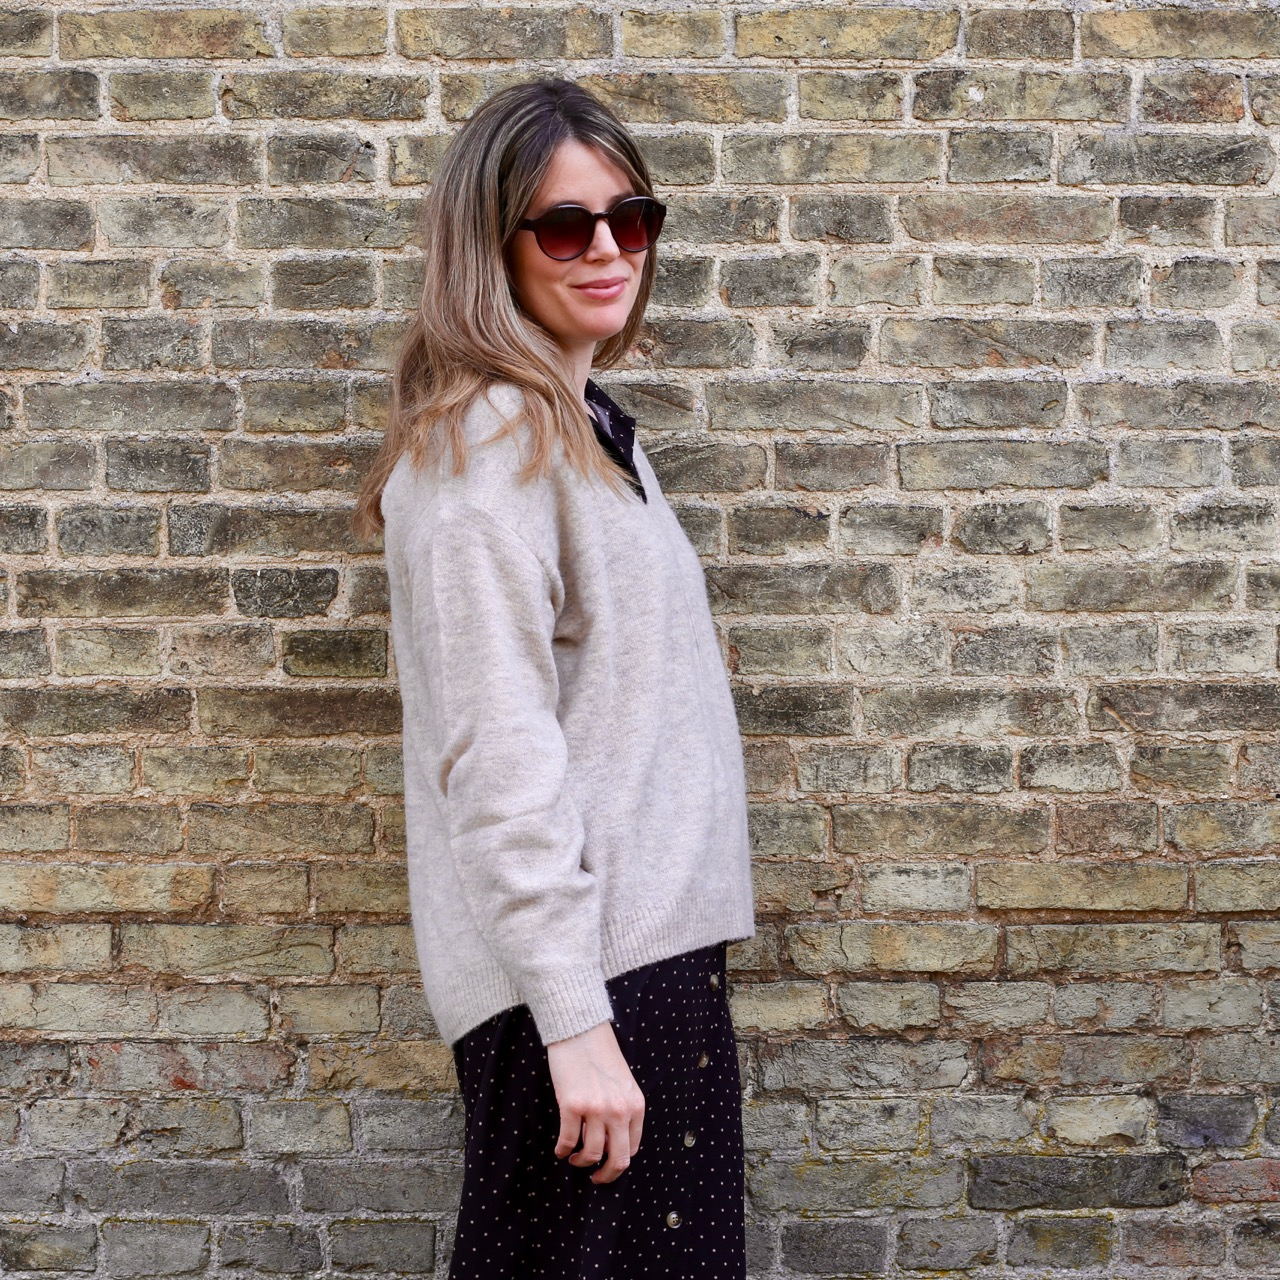 September fashion: shirtdress and jumper